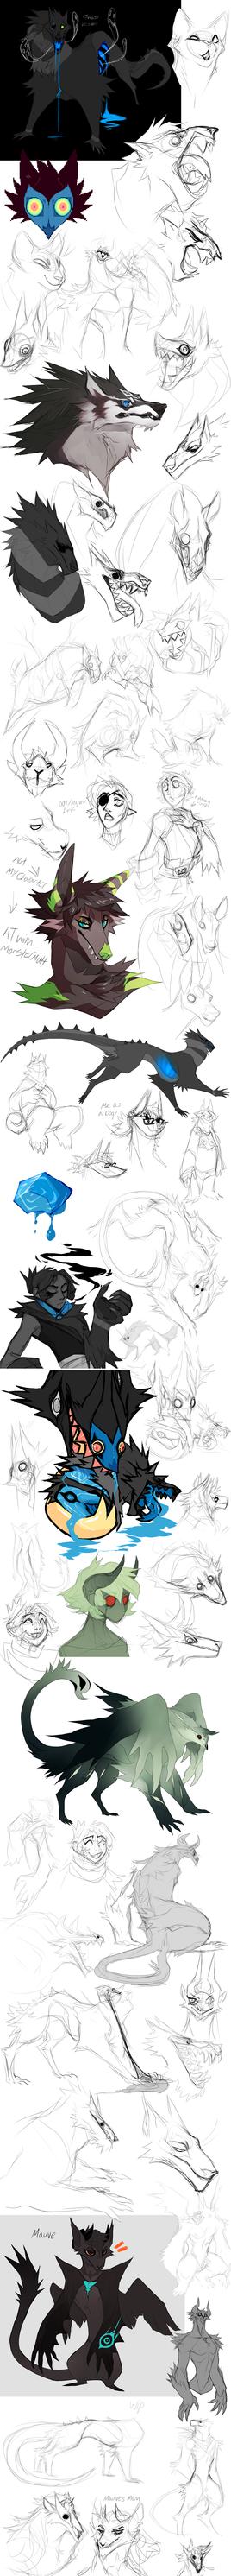 Sketch Dump no.17 by Dusty-Demon